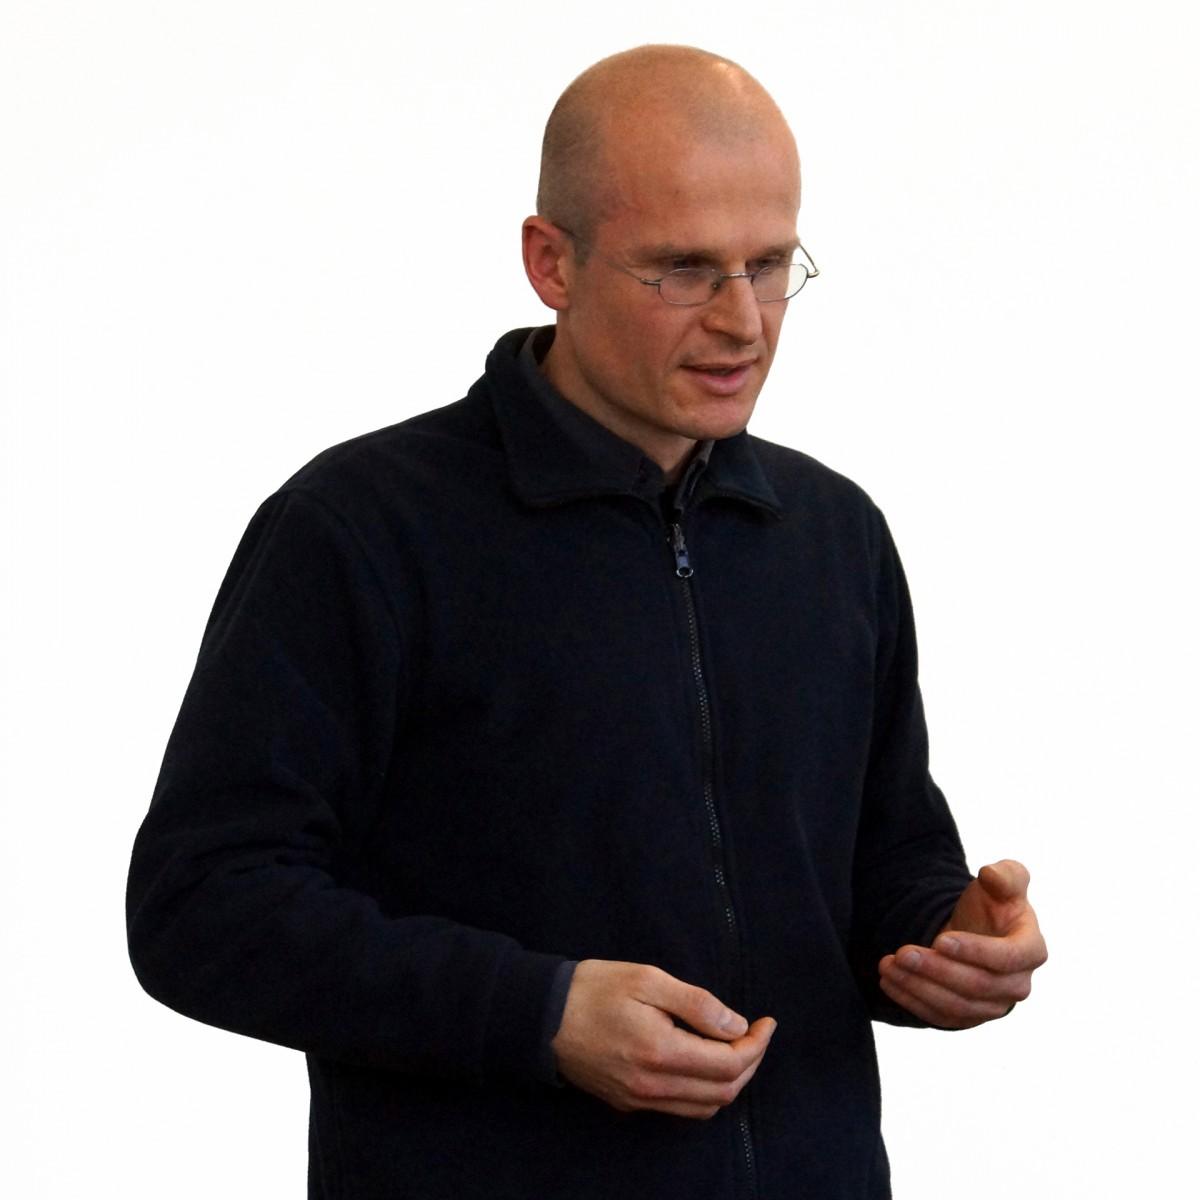 Jürgen Krause (Bild 8): Künstler im Gespräch – Kunsthaus Nürnberg (2015)